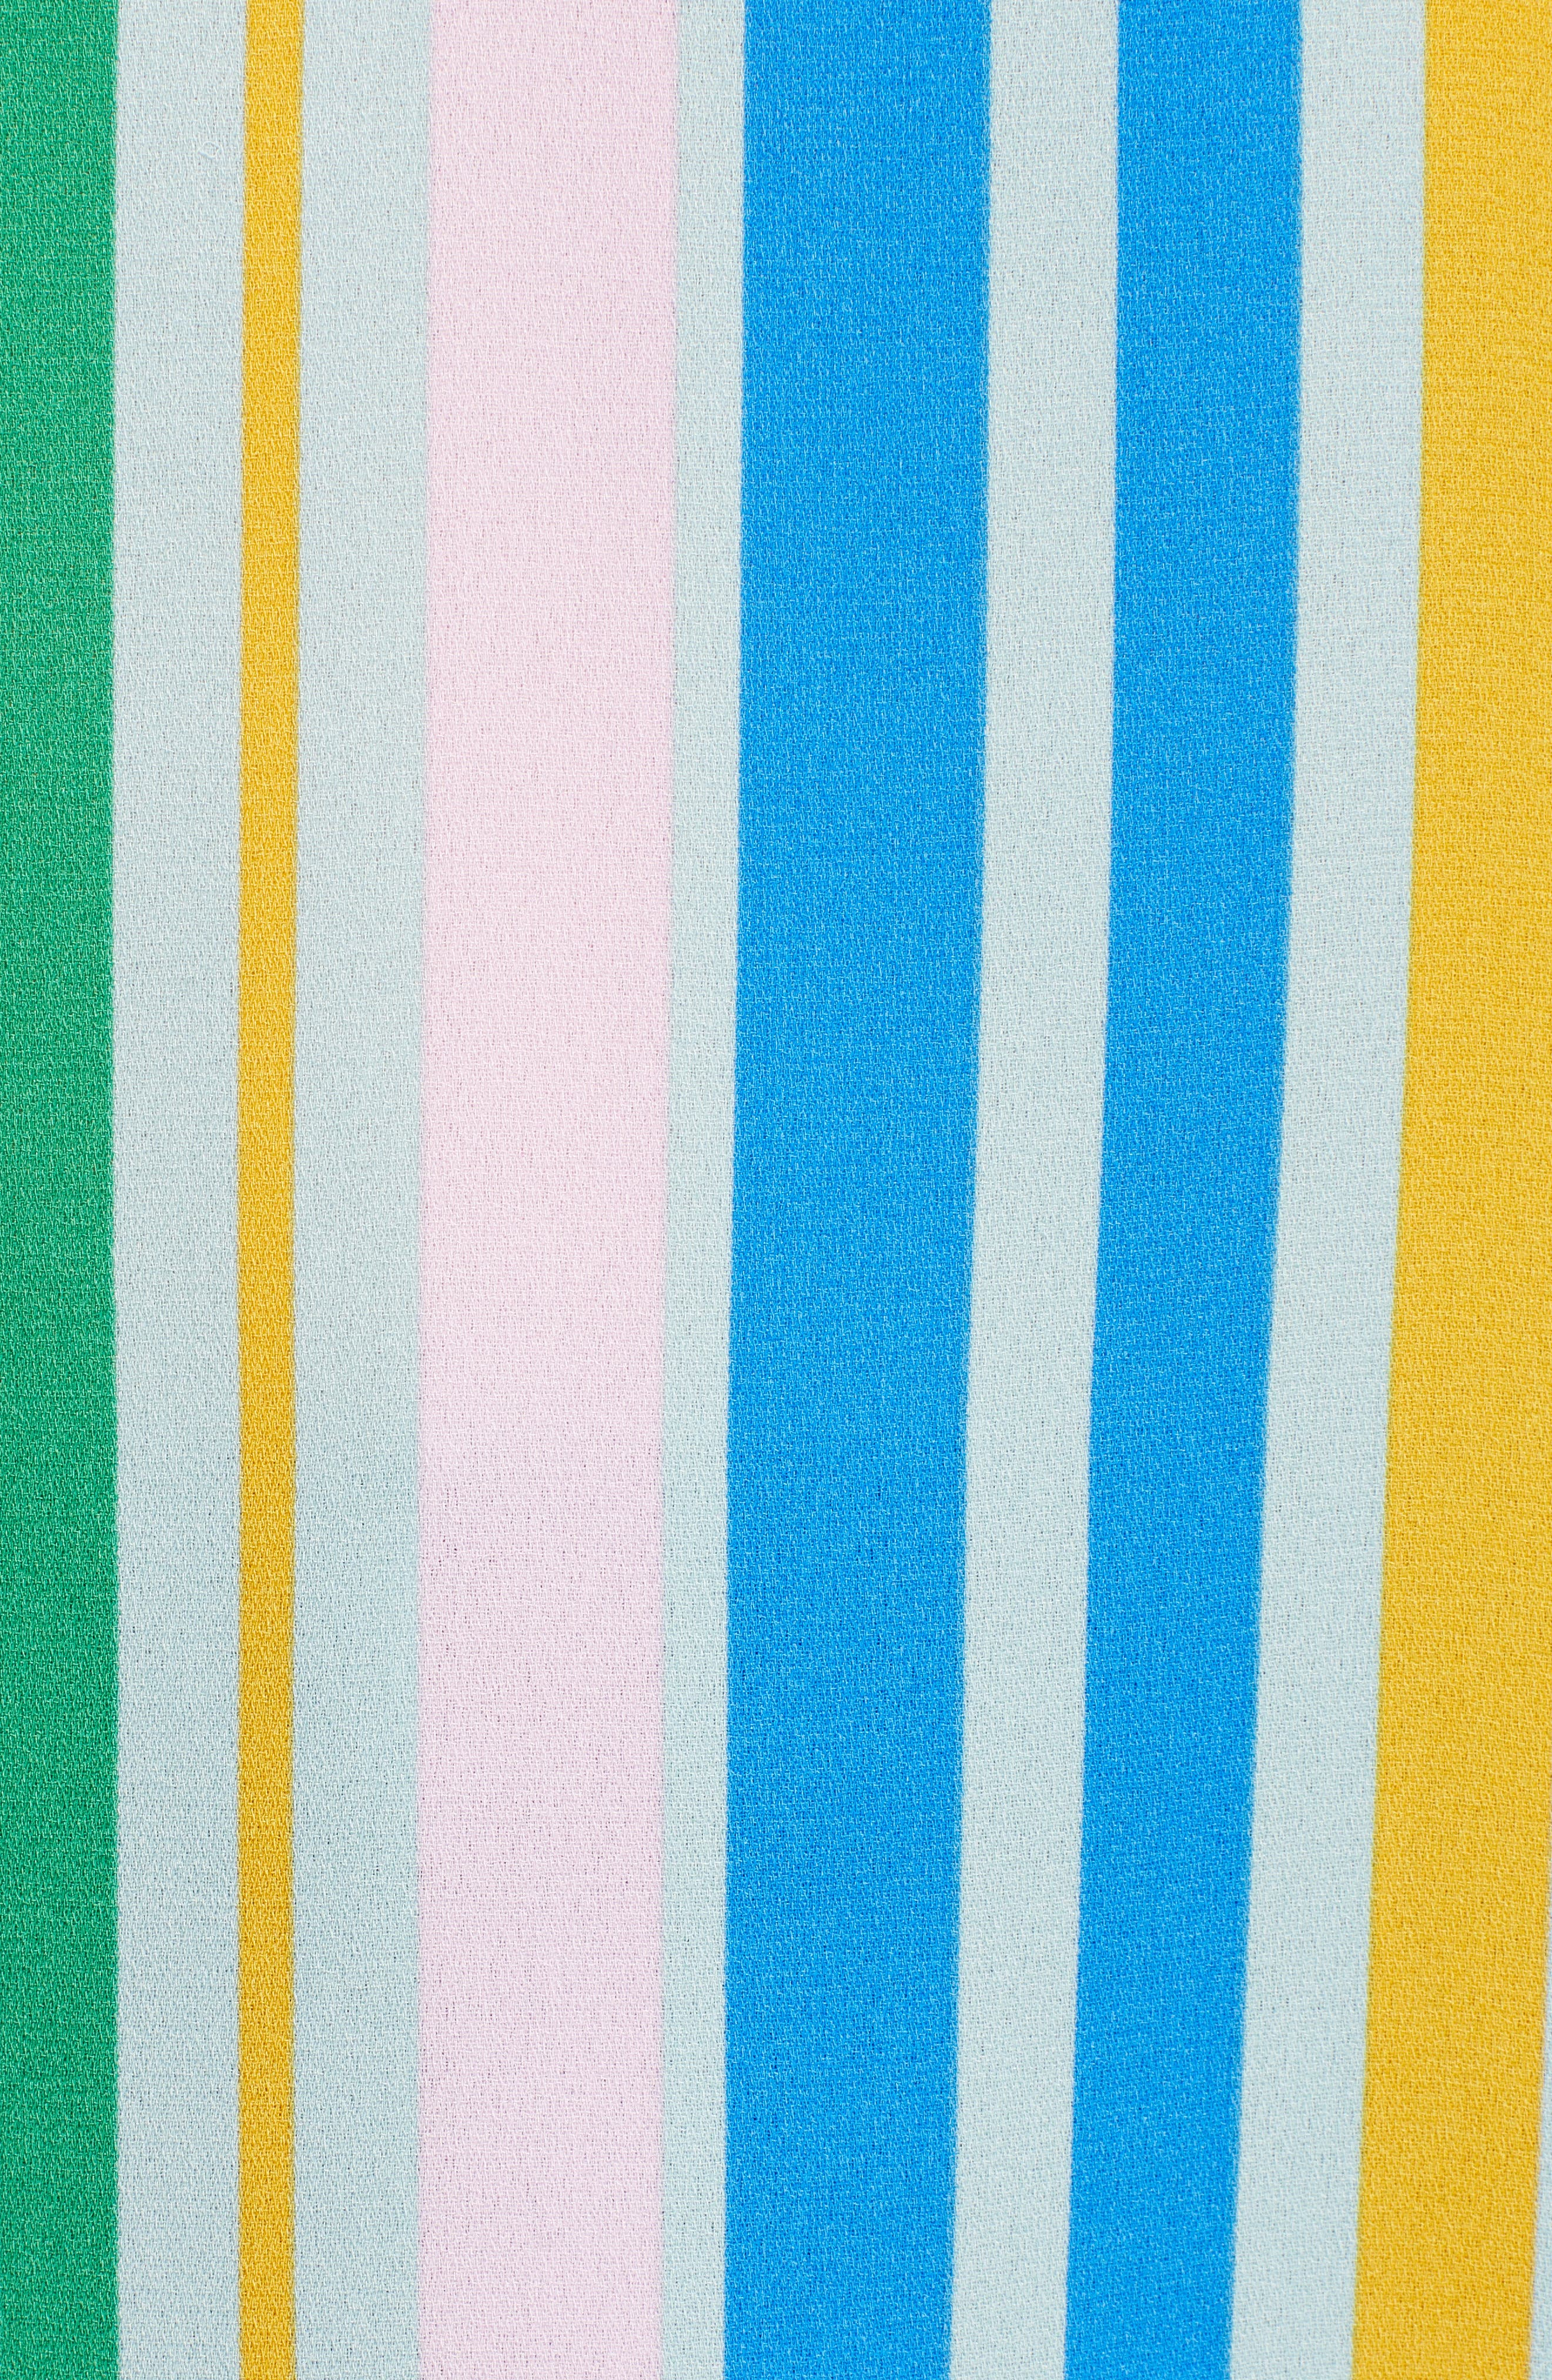 ,                             Racerback Camisole Top,                             Alternate thumbnail 7, color,                             BLUE FRENCH MULTI STRIPE